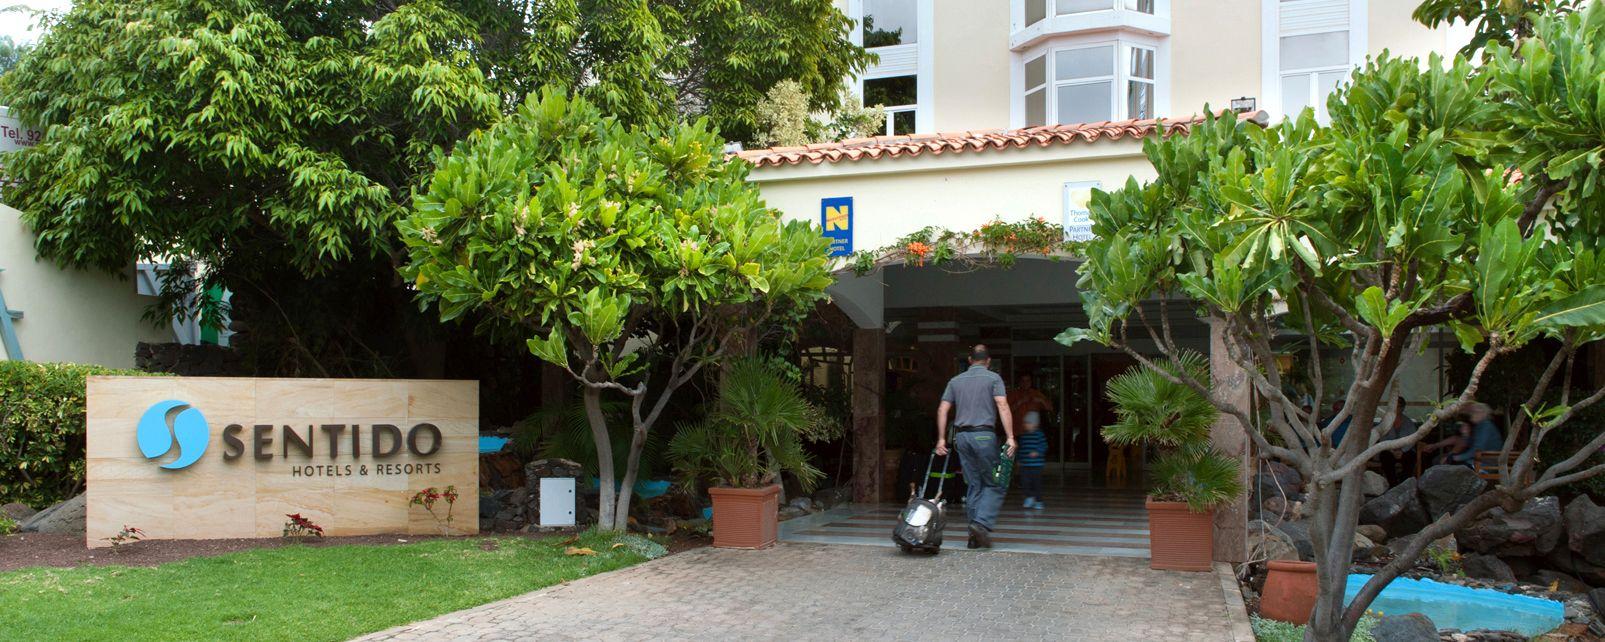 Hôtel Sentido Bunganvilla Jandia